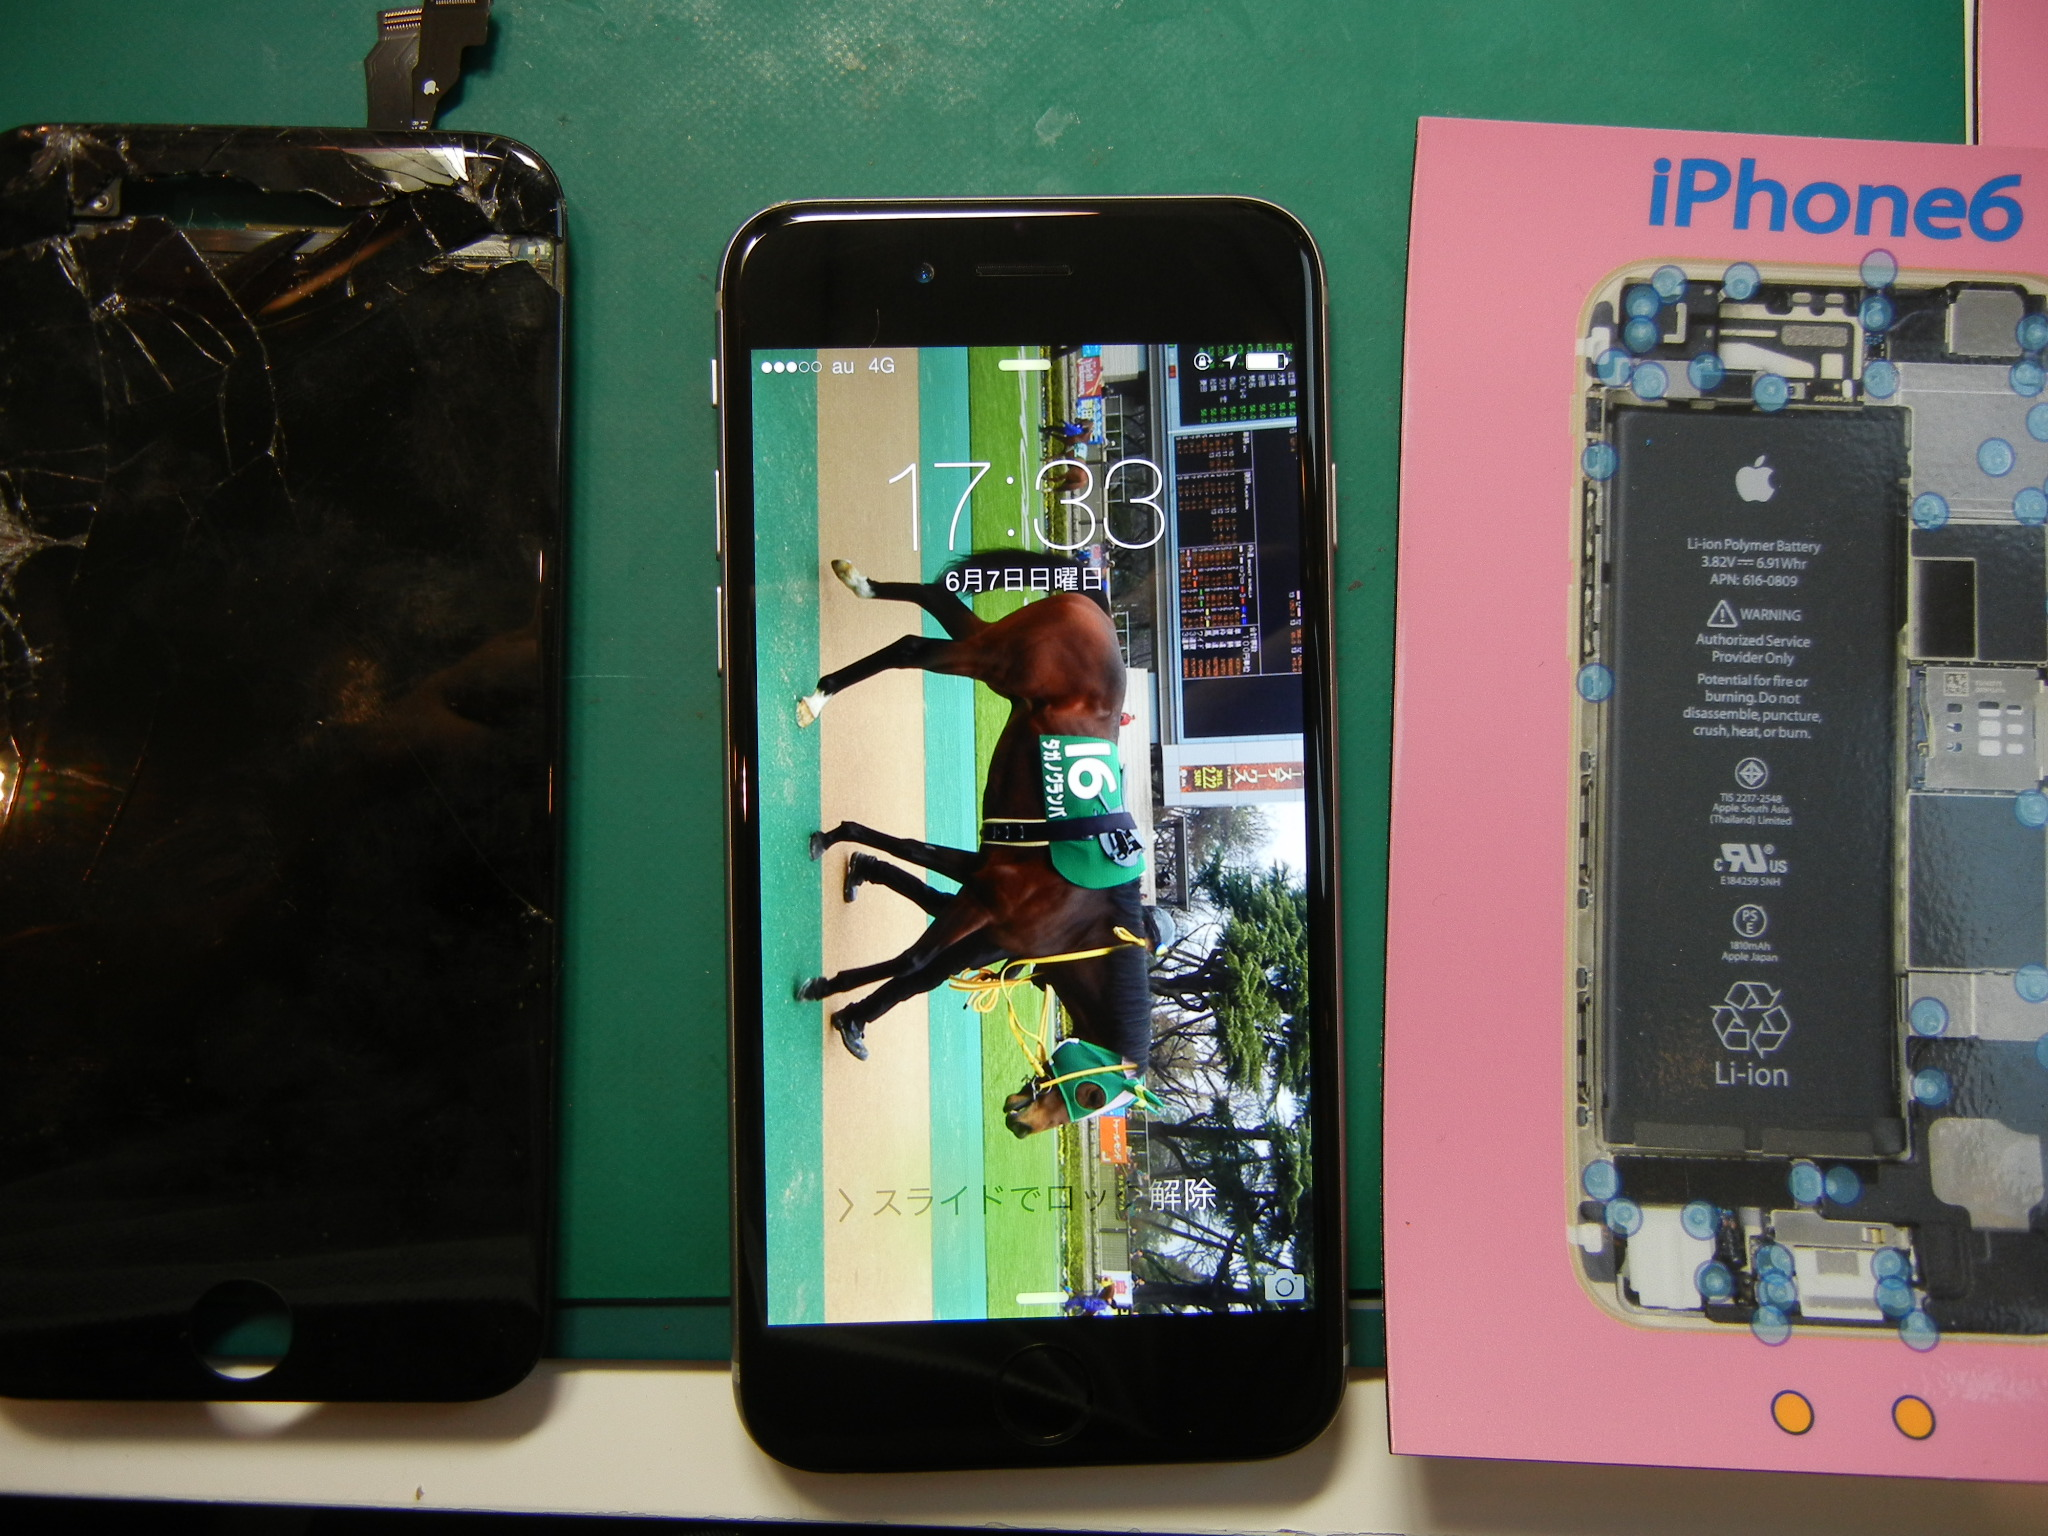 iPhone6ガラス割れ修理はiFC埼玉戸田店0701